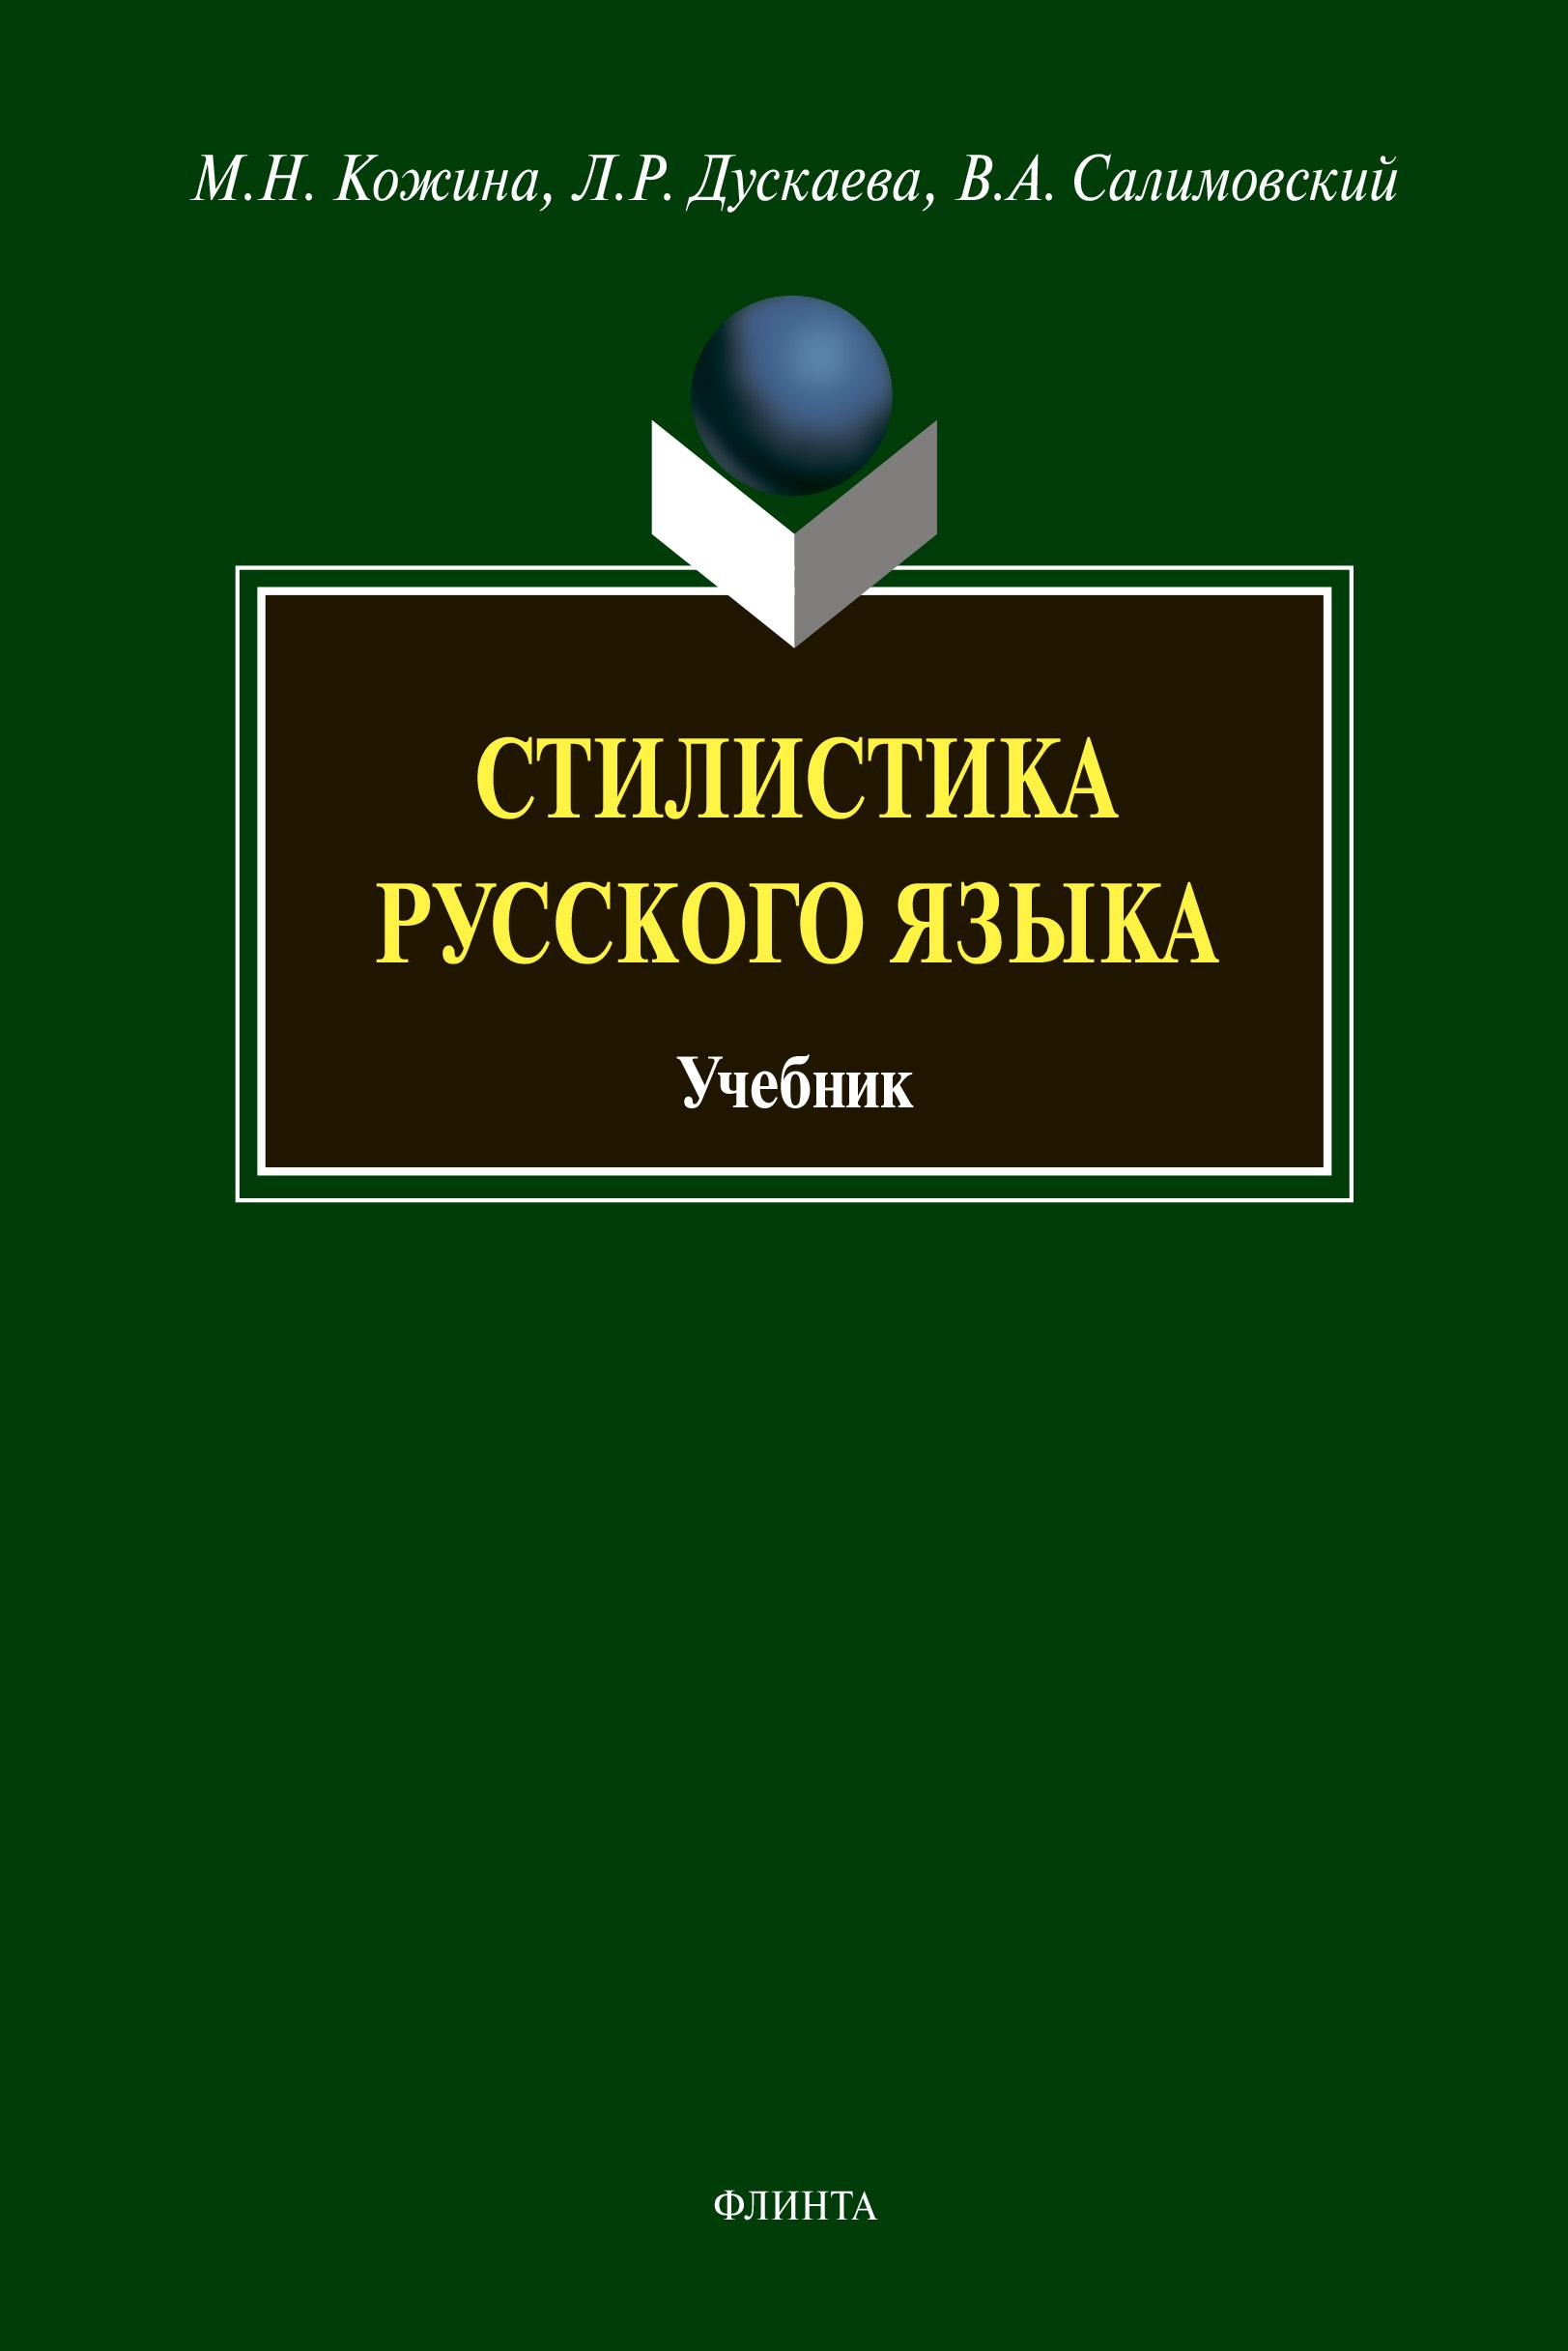 цена на М. Н. Кожина Стилистика русского языка. Учебник